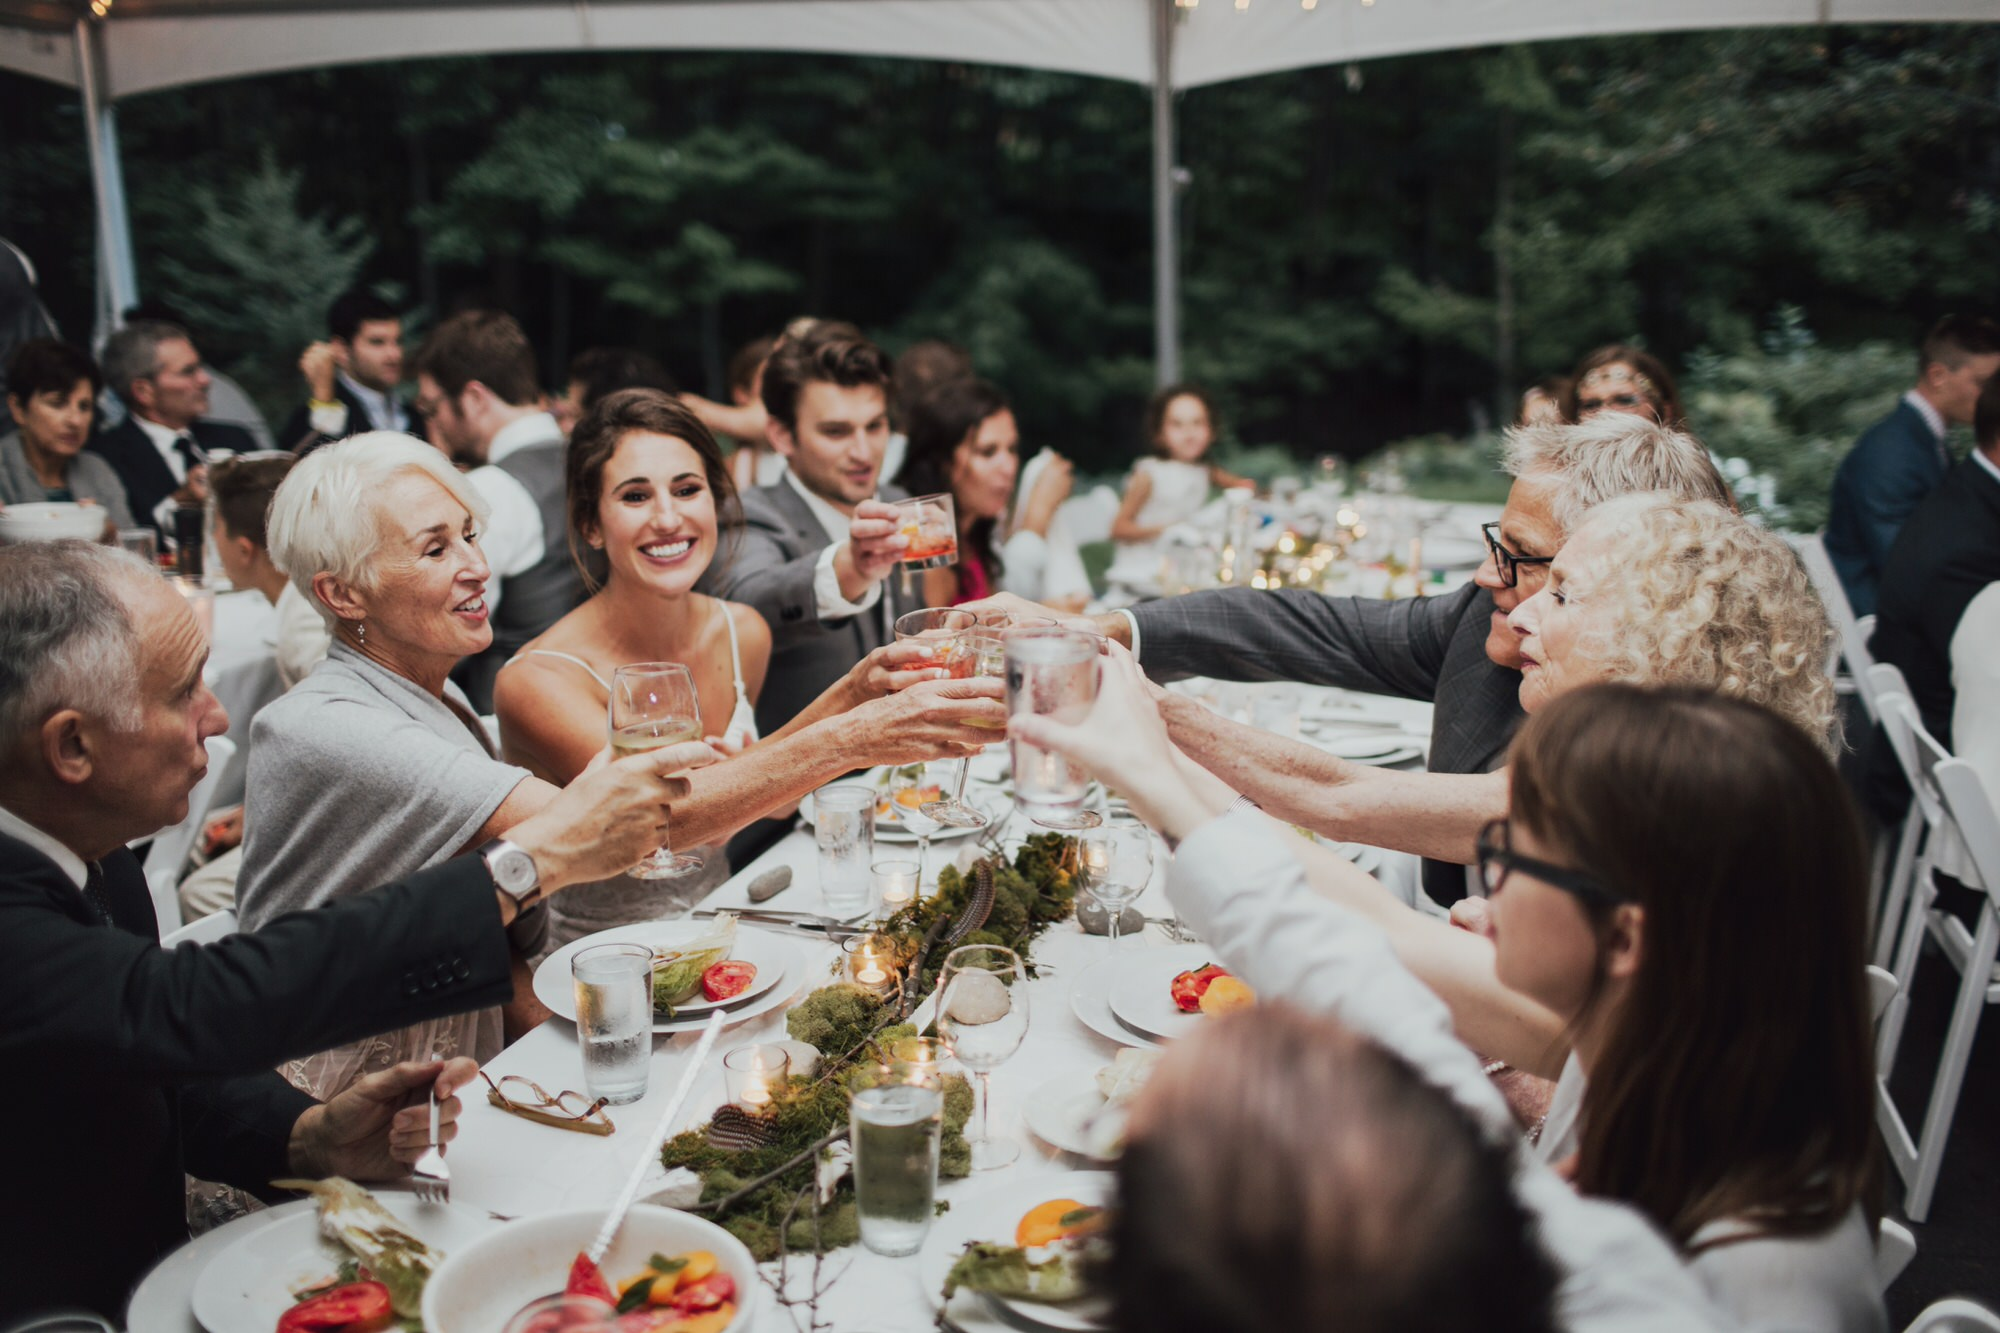 emily-aaron-rochester-new-york-wedding-photographer-111.JPG